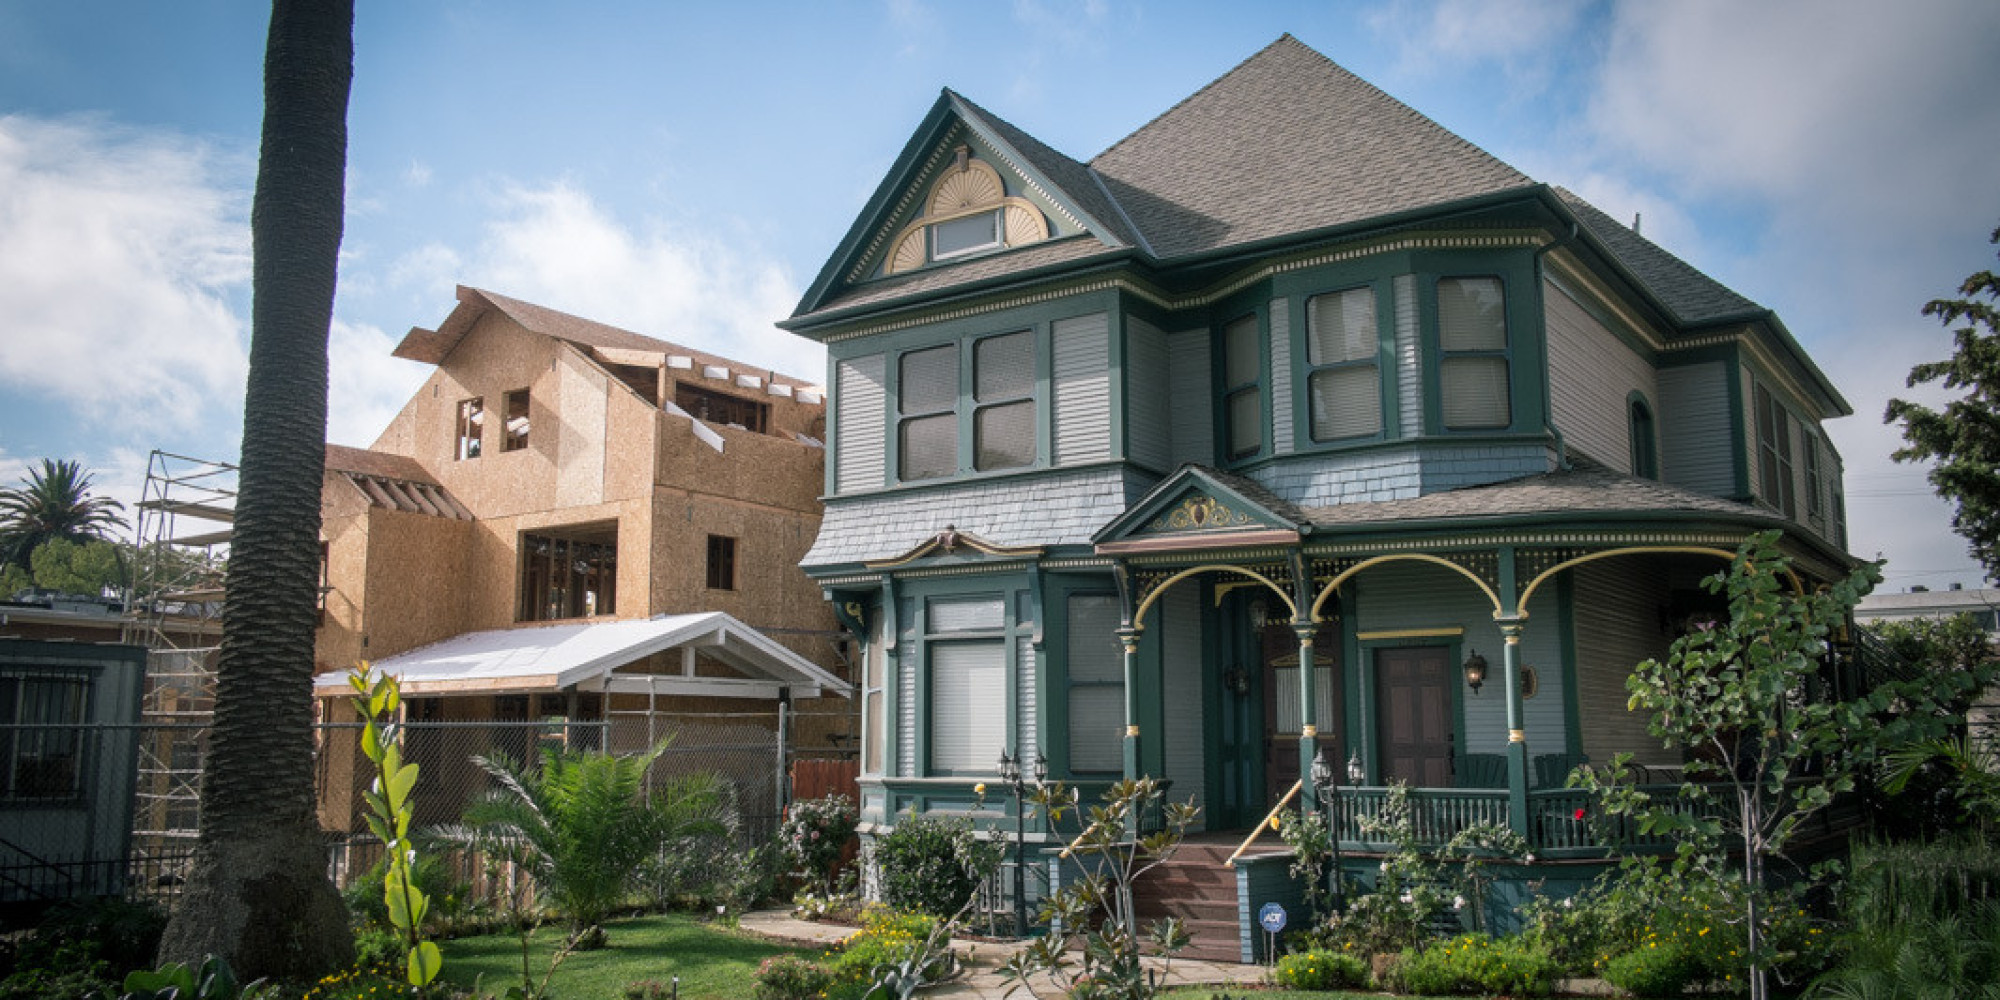 View West Omaha, Omaha, NE Home Values, Housing Market ...